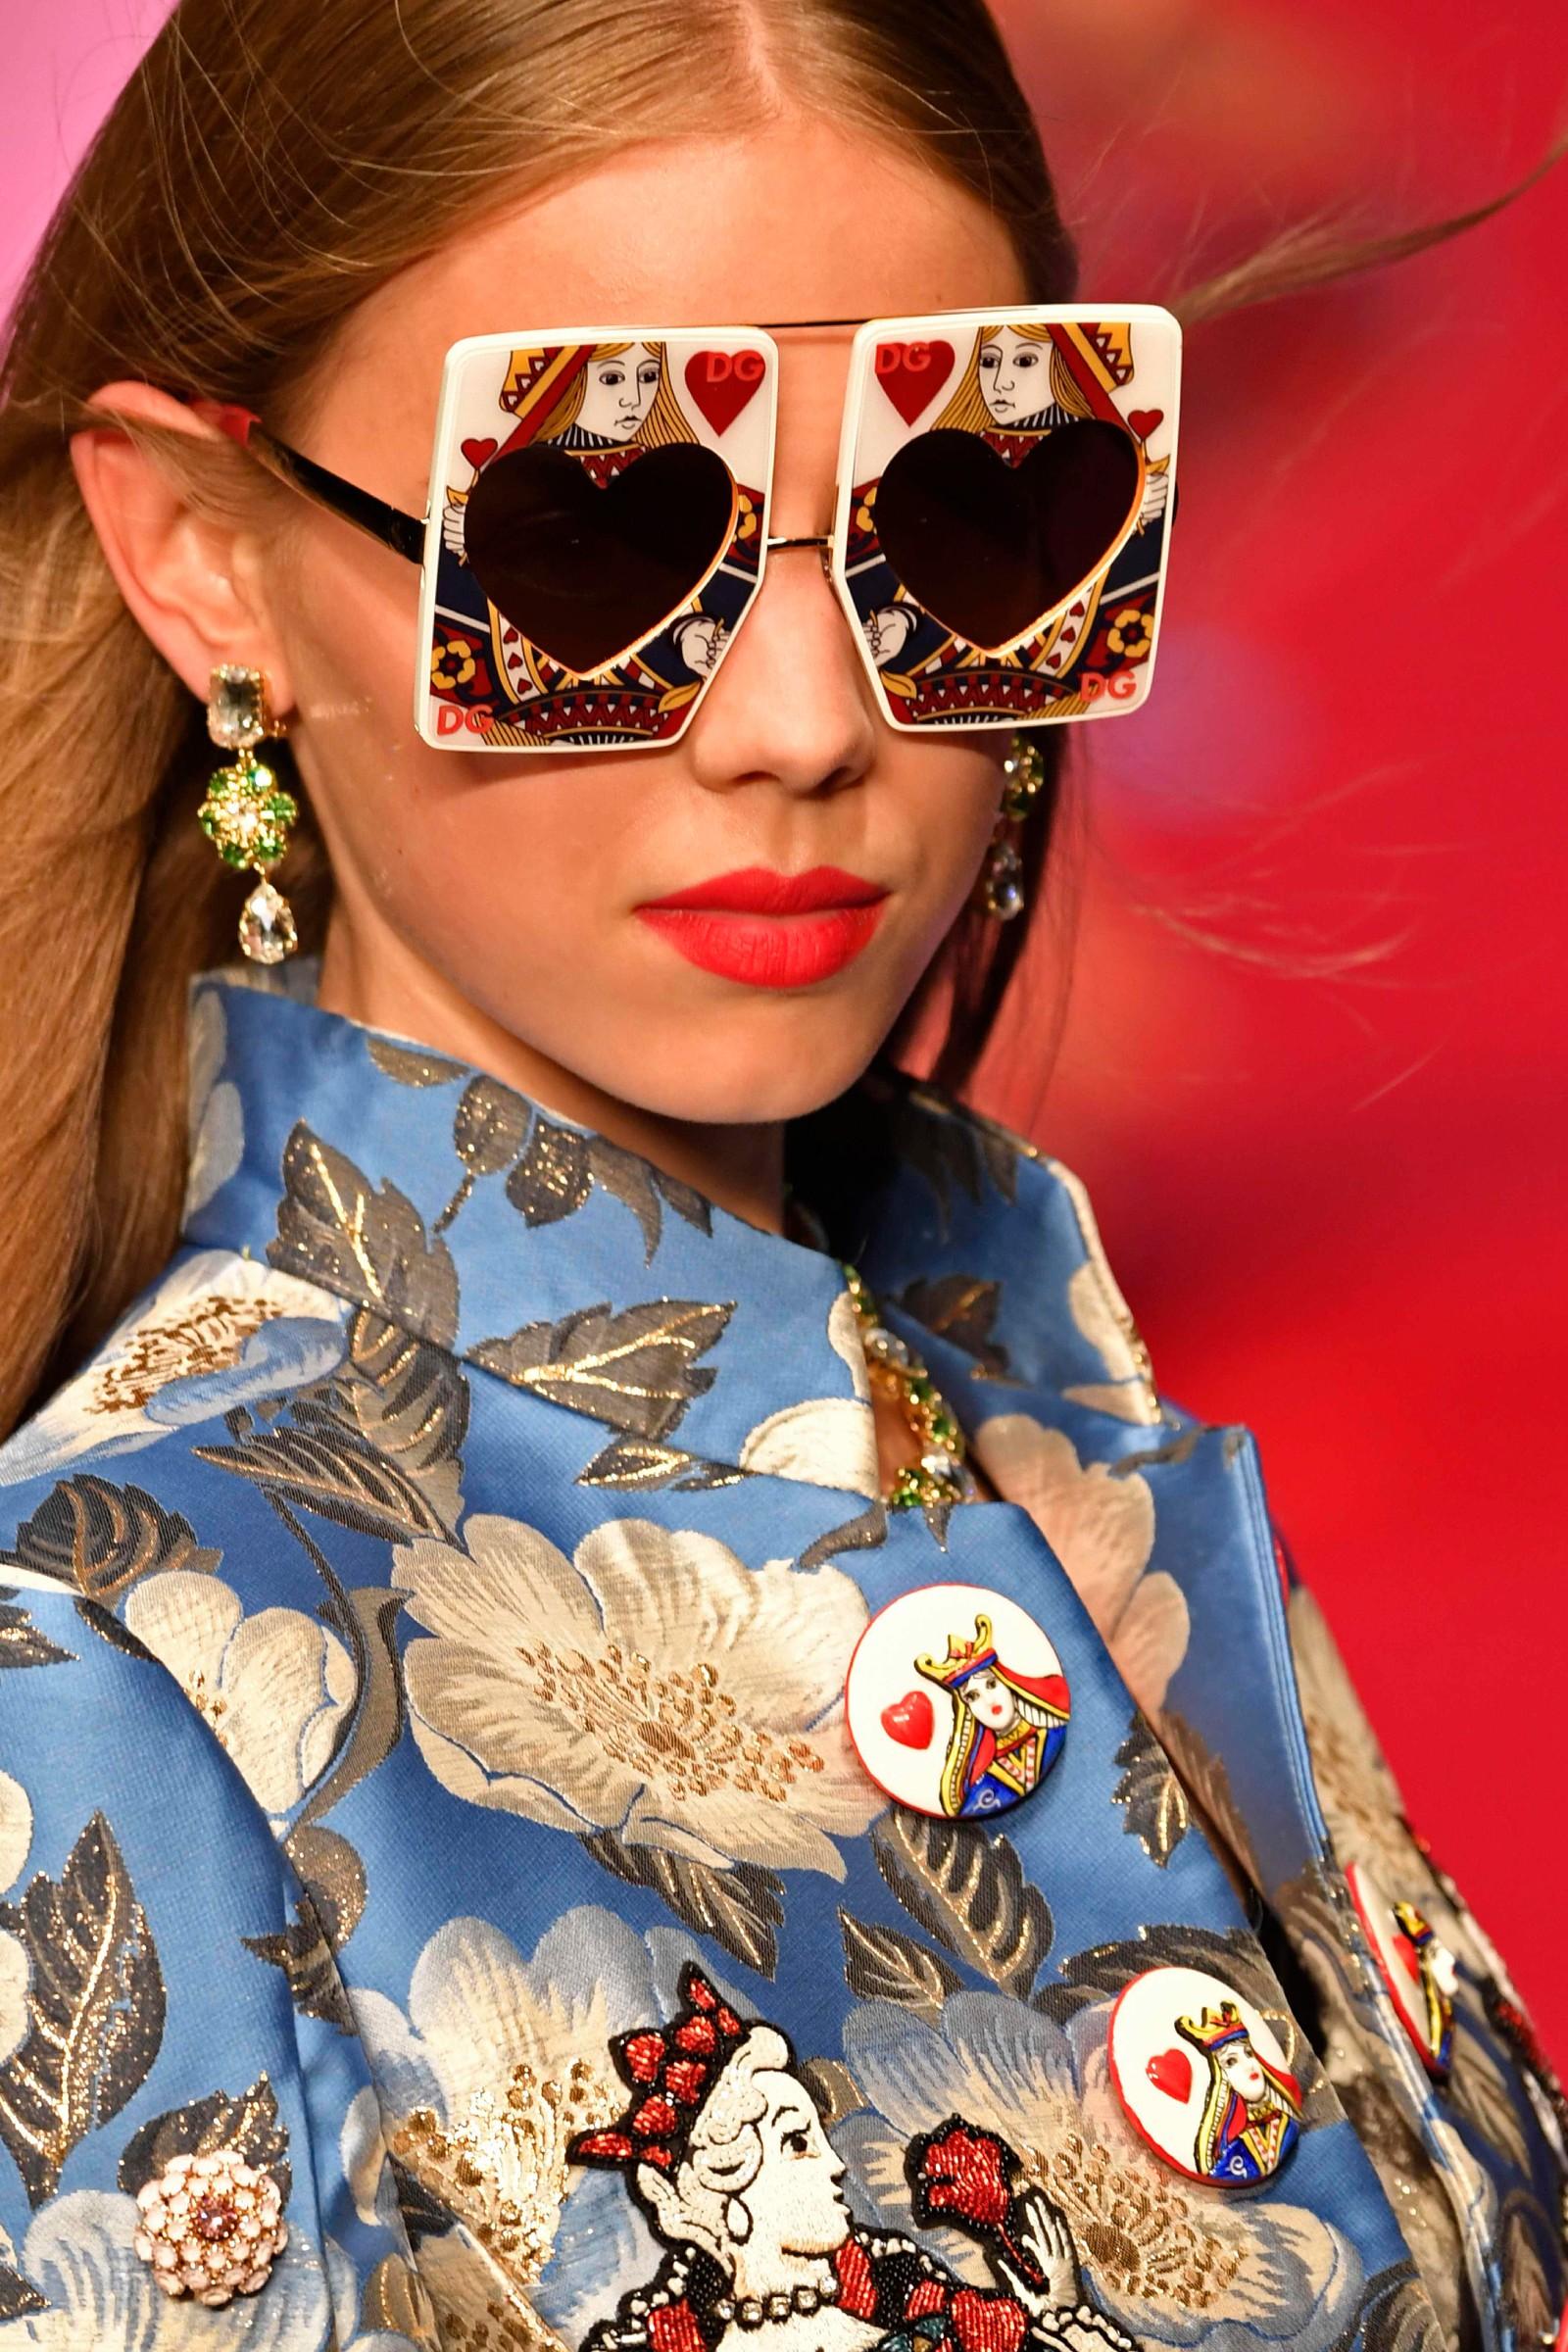 Dolce & Gabbana: Kortstokk-briller.